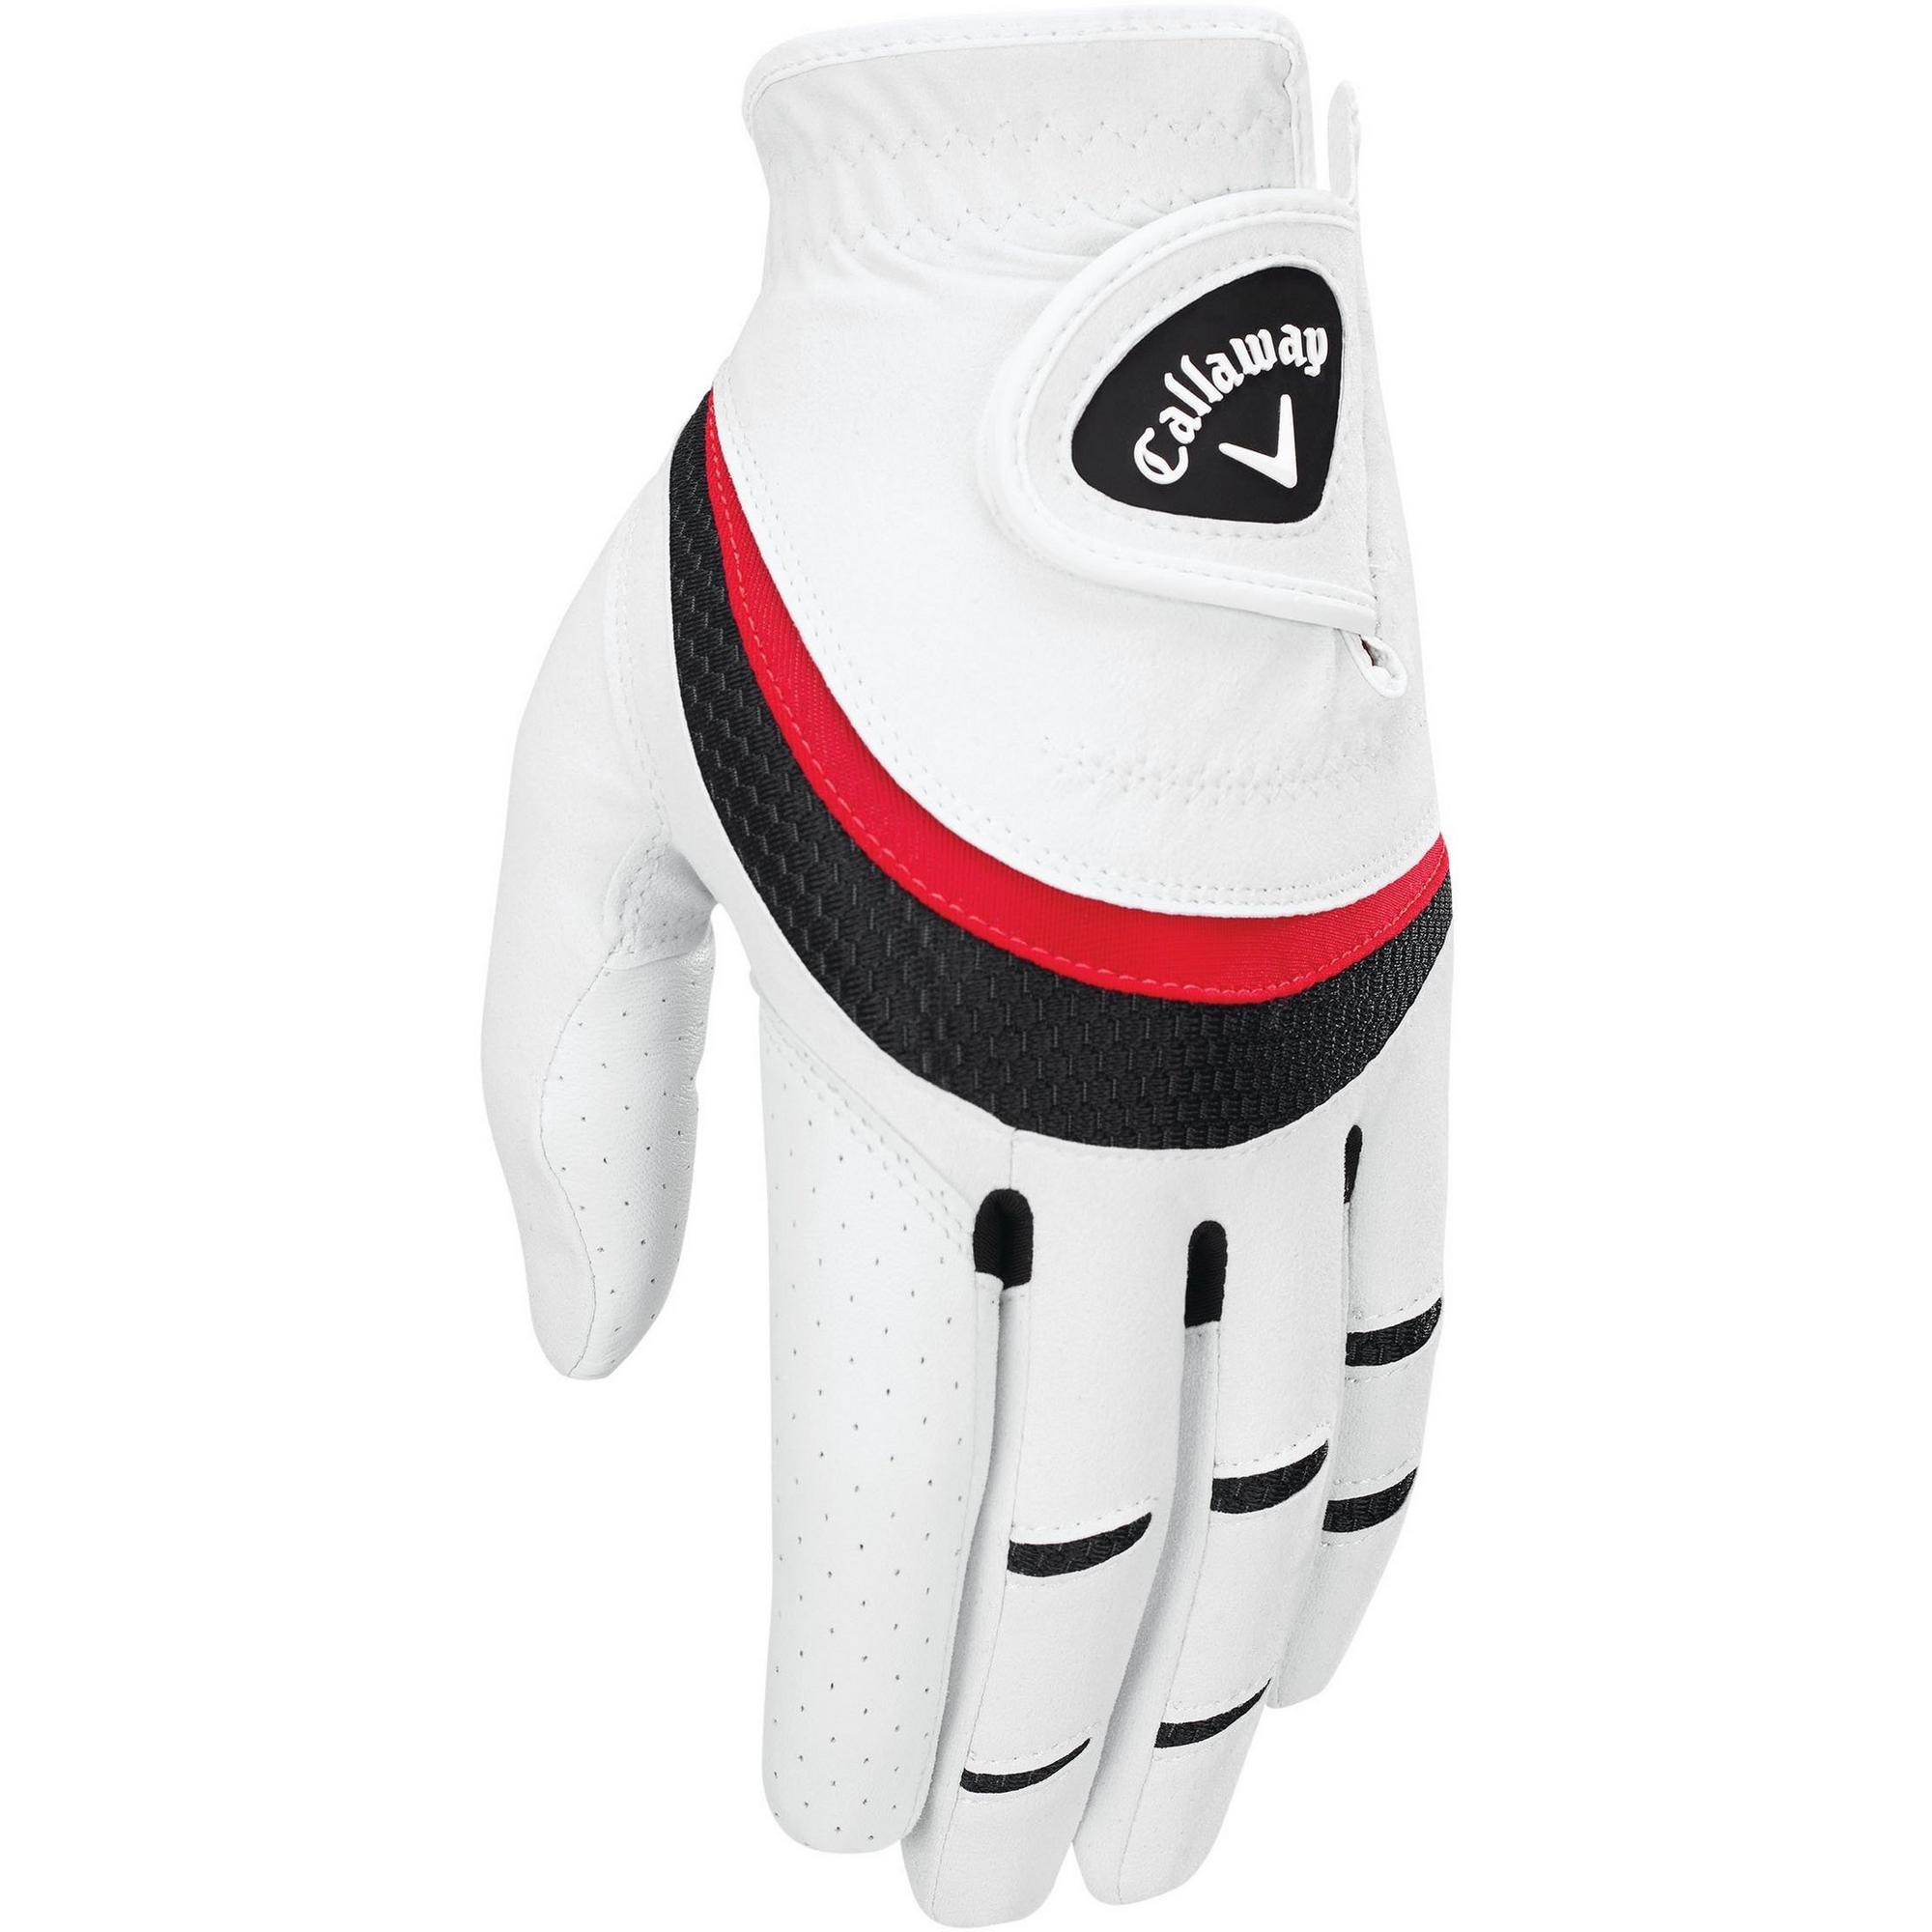 Fusion Pro Cadet Golf Glove